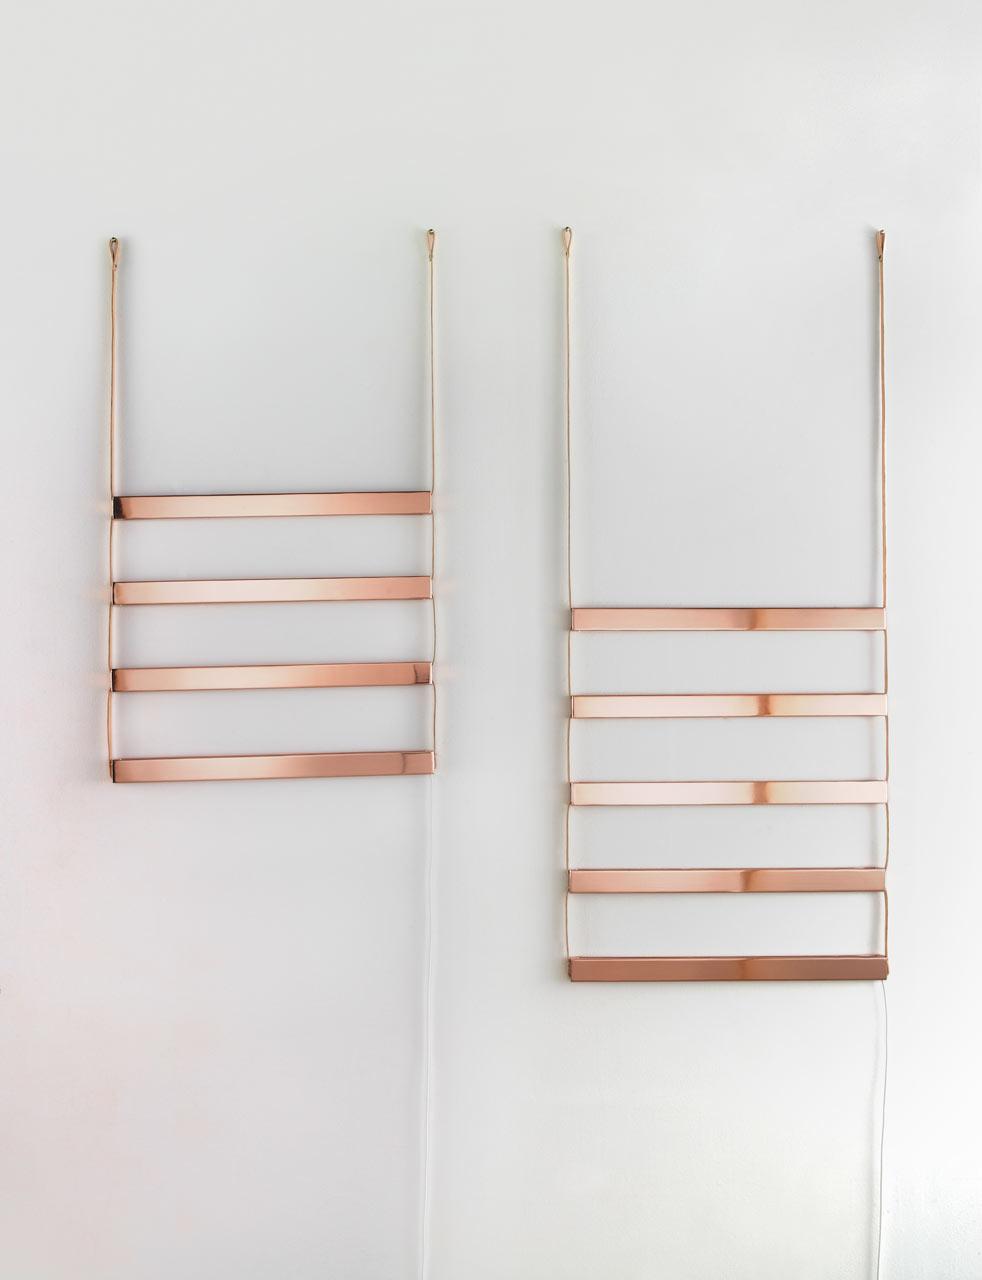 Ladder Light by MSDS Studio